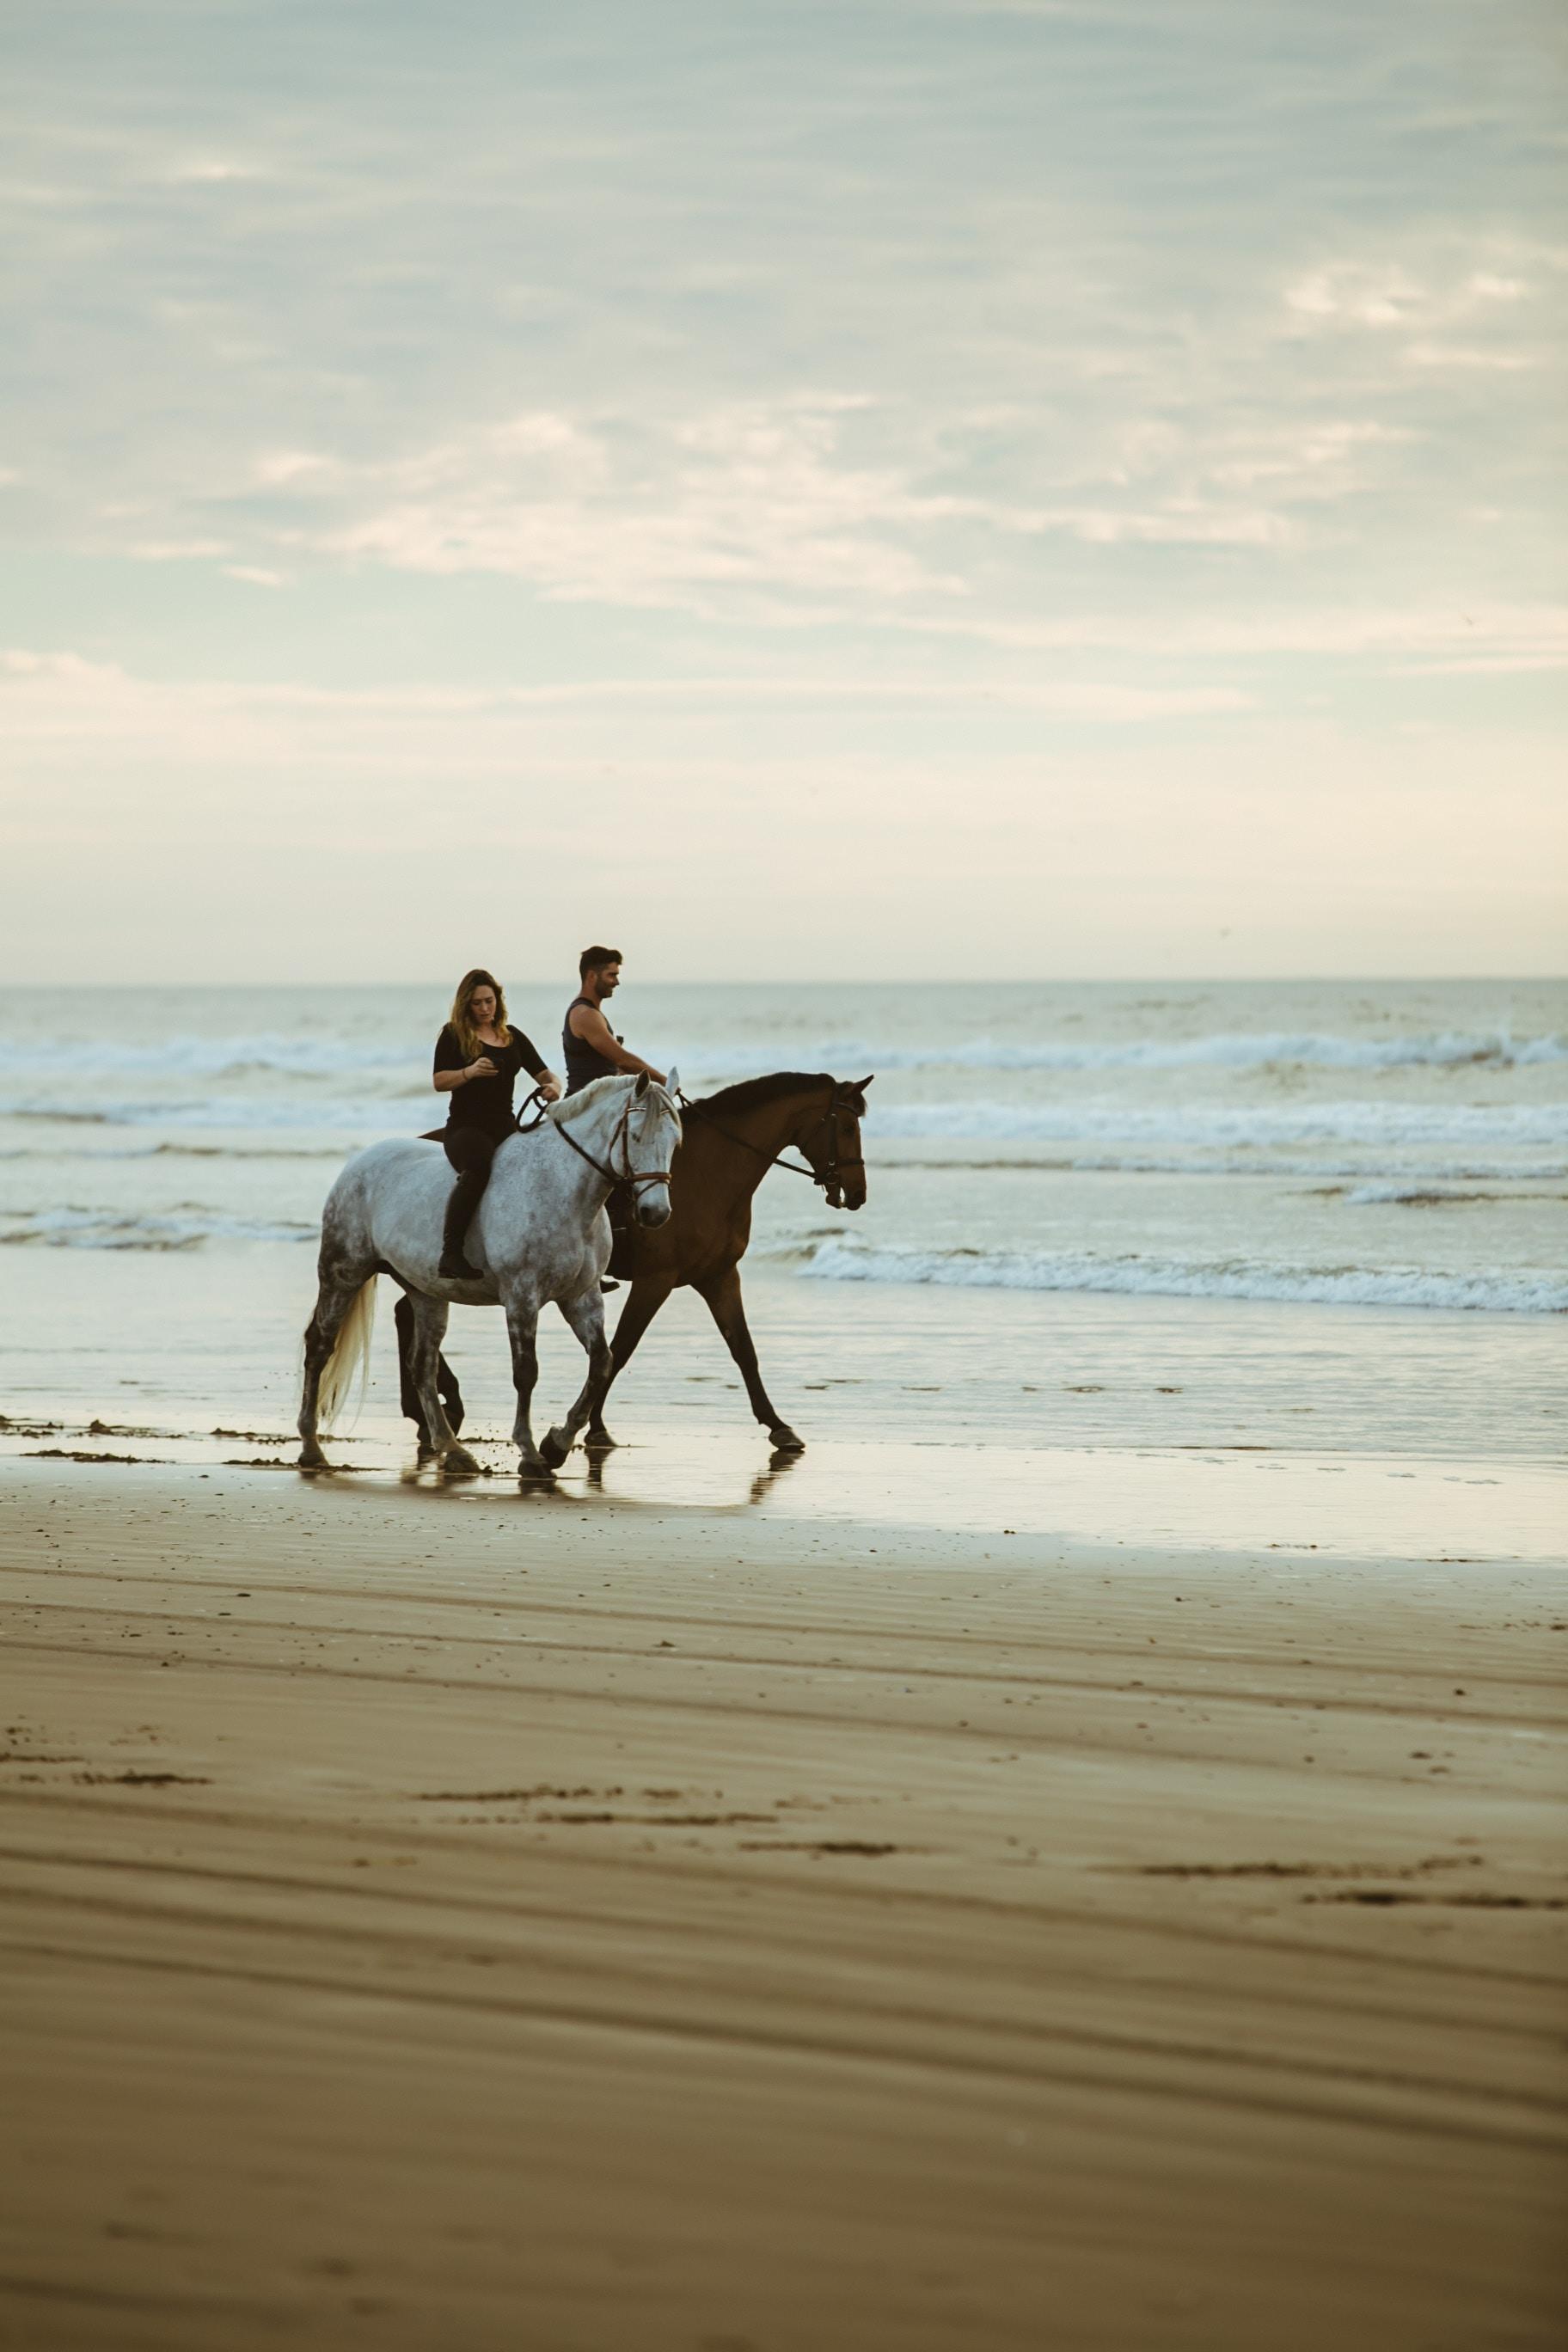 chateaux de bagnols horses beach horseback